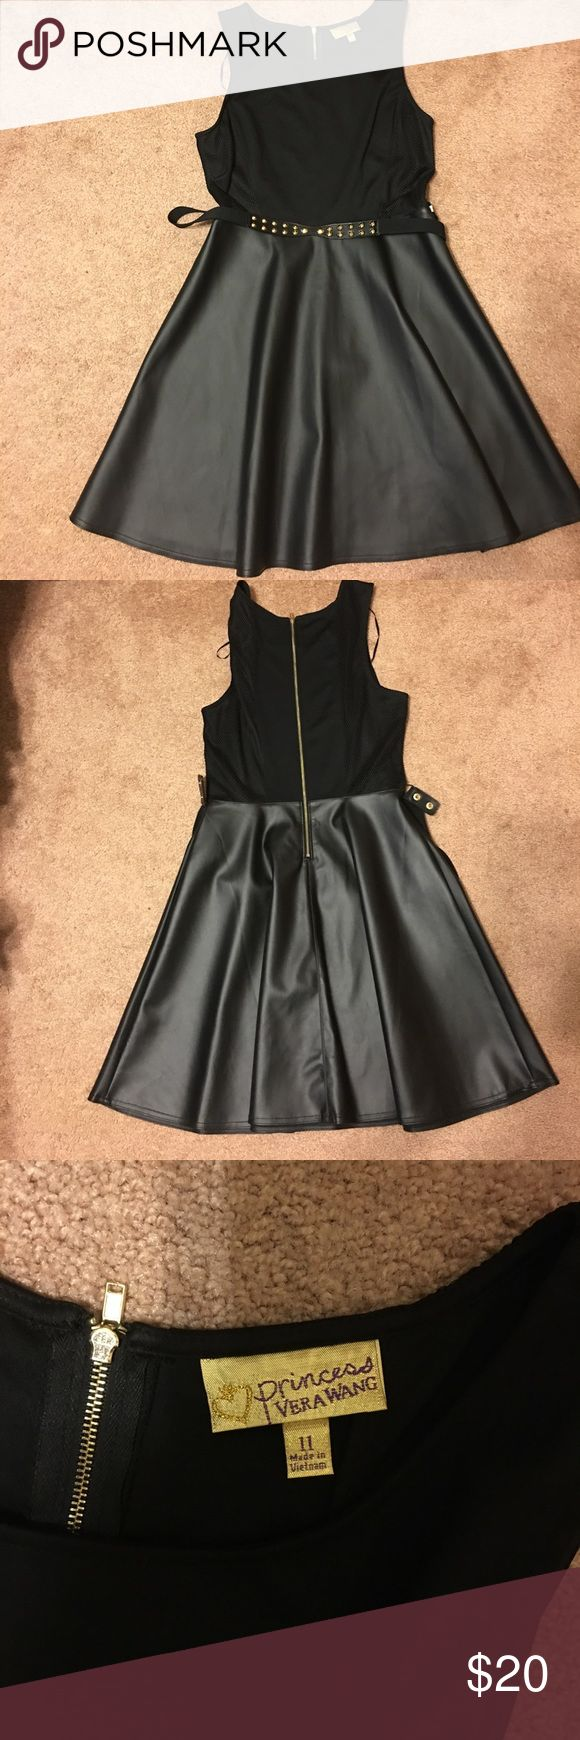 Skater style black dress Black skater style Vera Wang dress! Super cool! Worn once! Juniors size 11 Vera Wang Dresses Mini